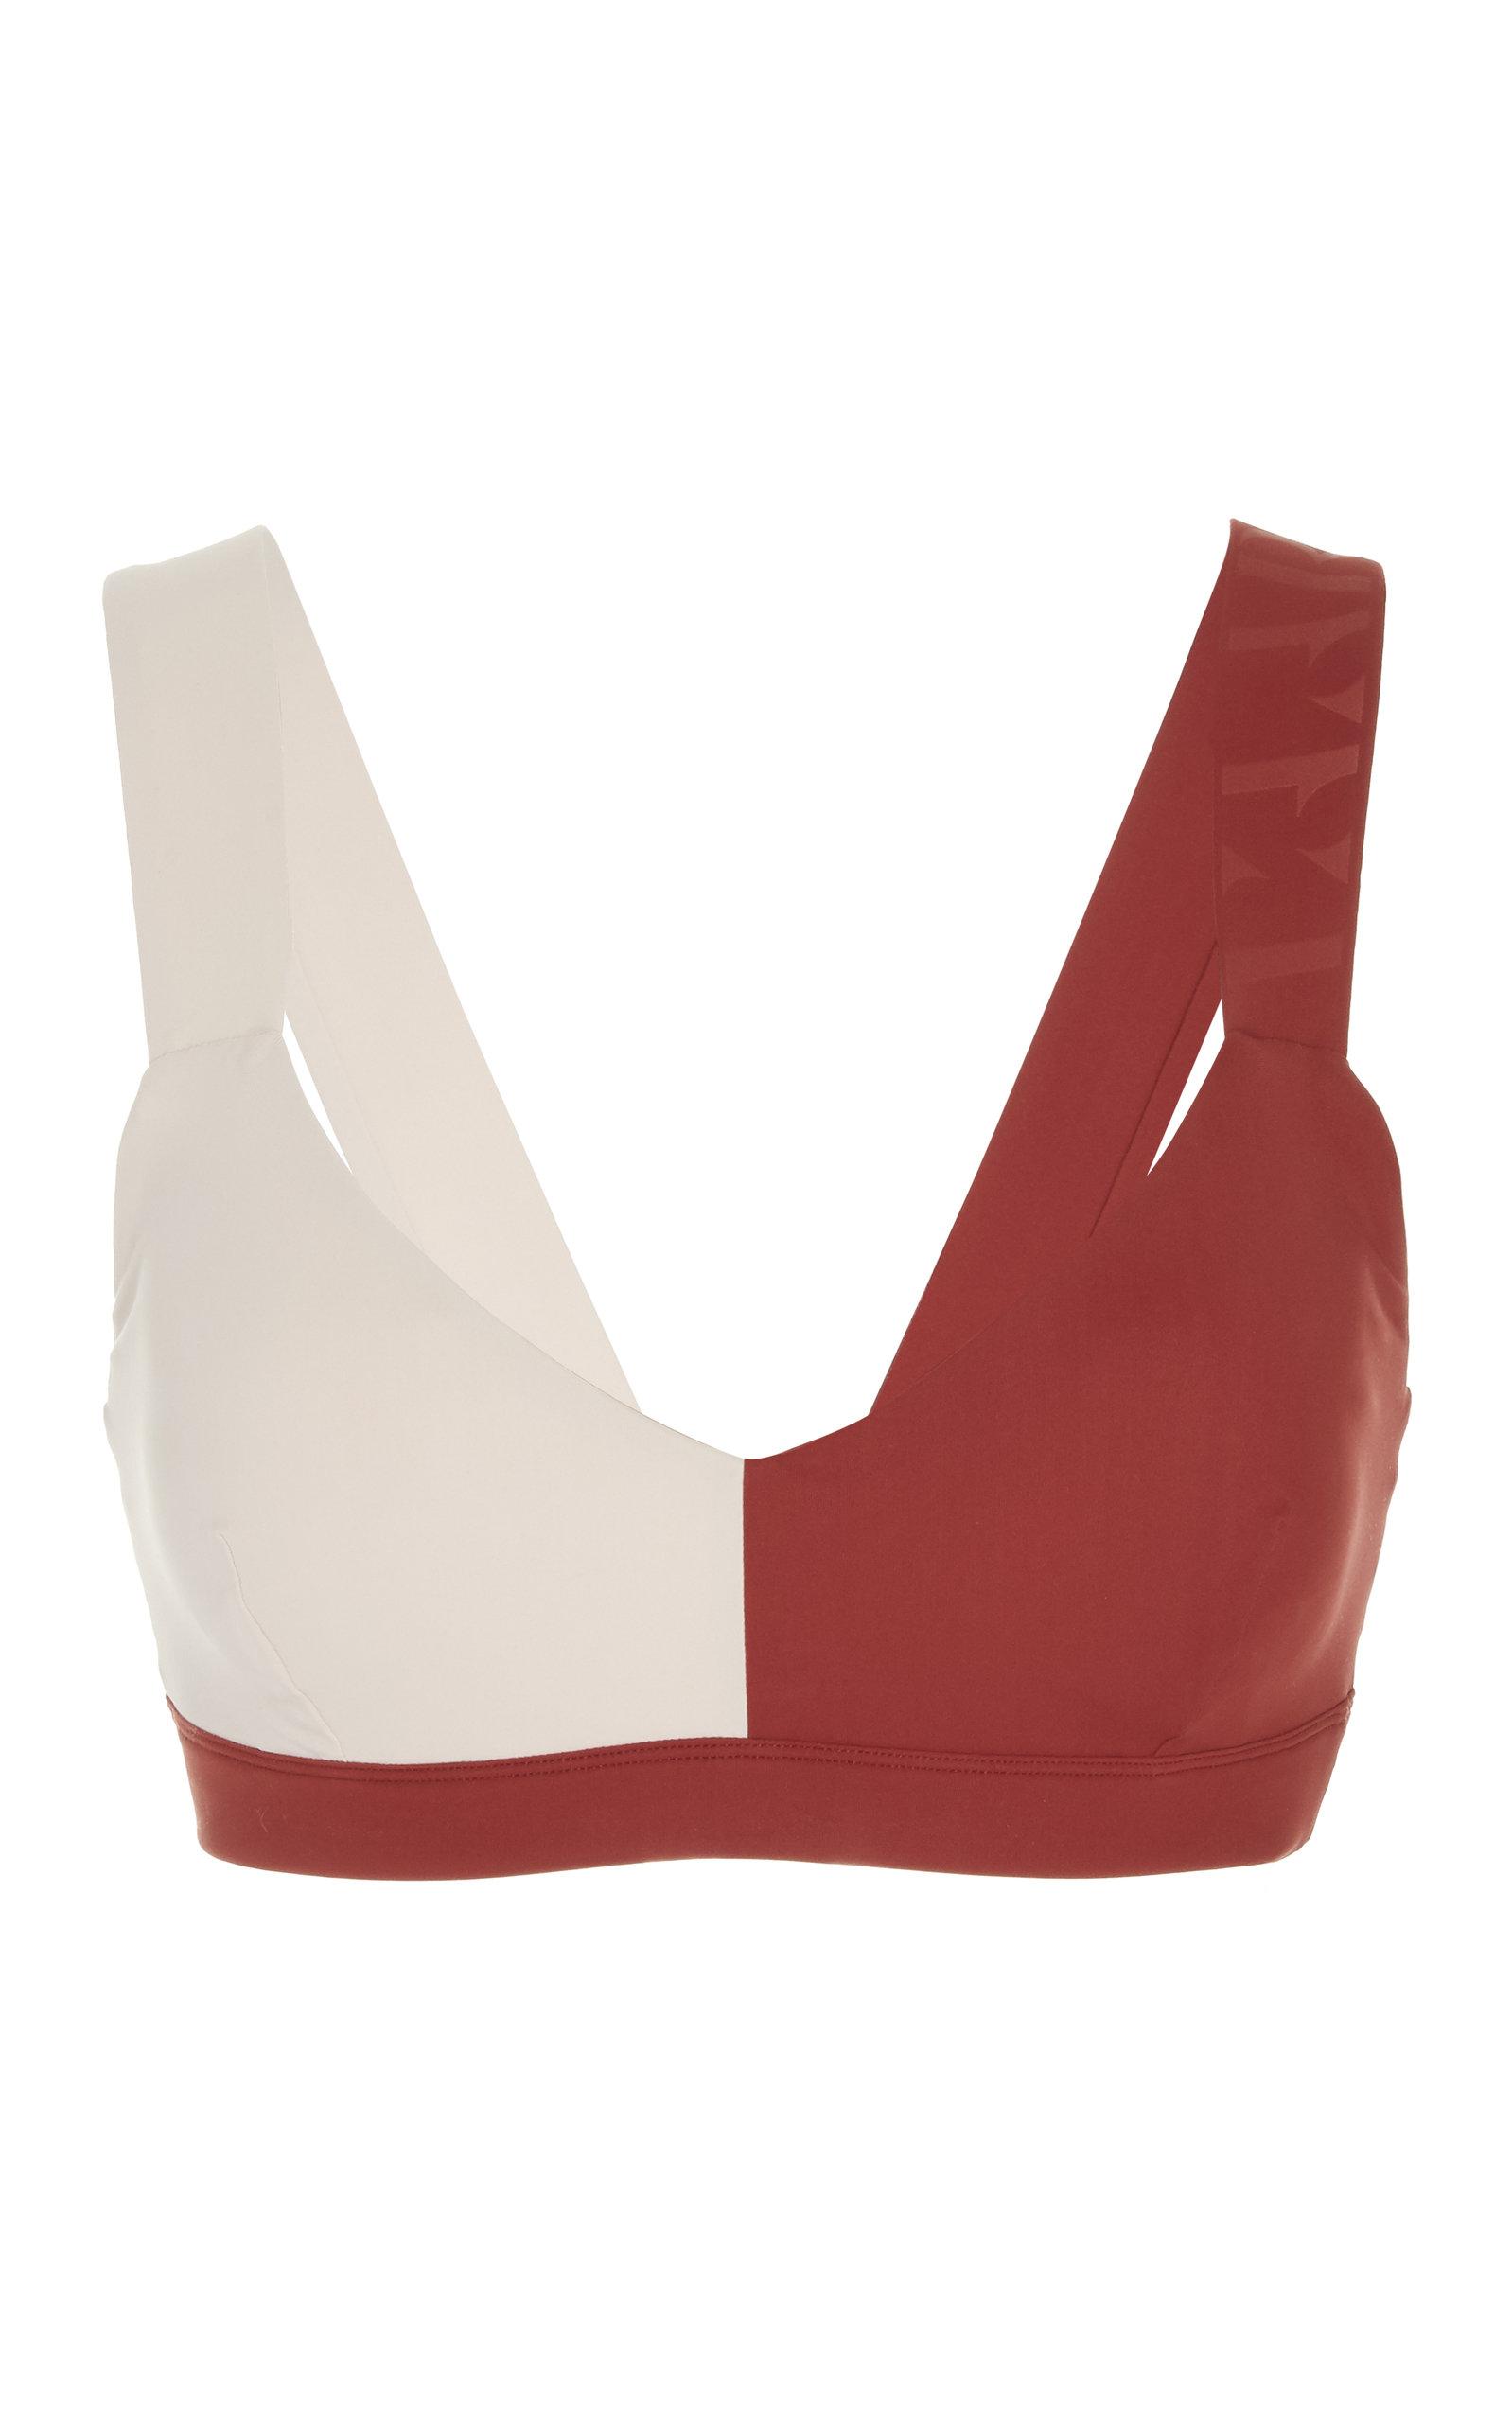 VAARA Elsa Two-Tone Stretch-Knit Sports Bra in Red